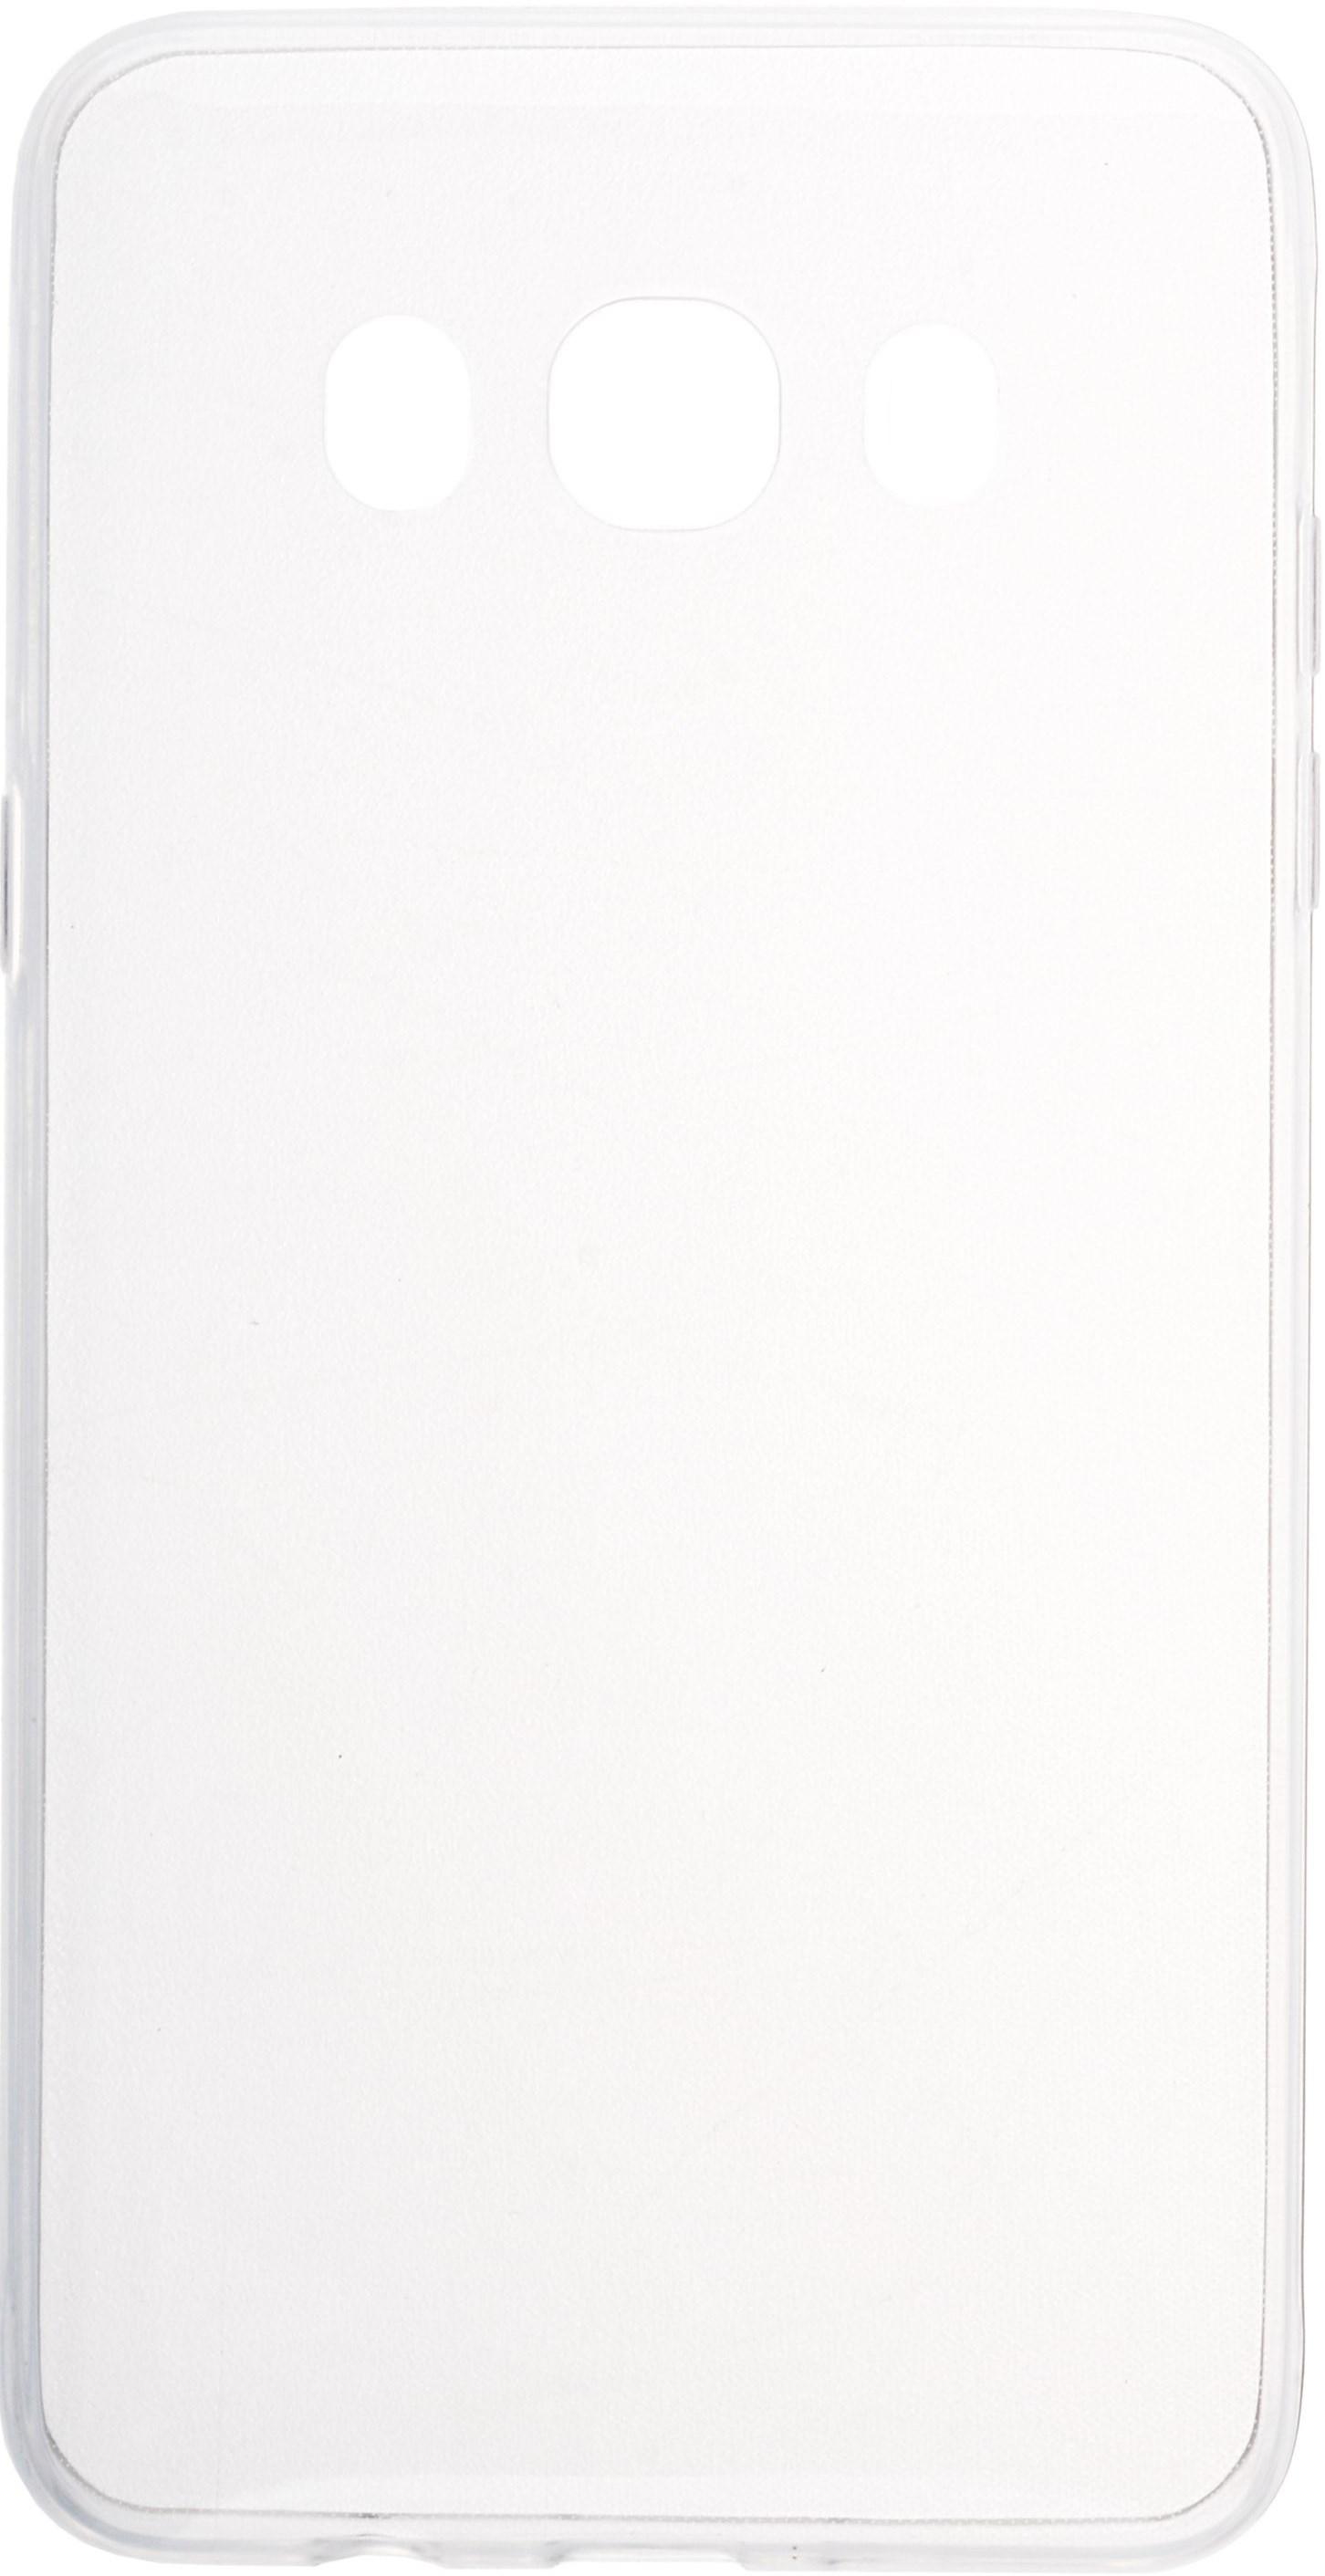 Чехол для сотового телефона skinBOX Slim Silicone, 4660041407389, прозрачный накладка skinbox slim silicone для xiaomi redmi 4x прозрачный